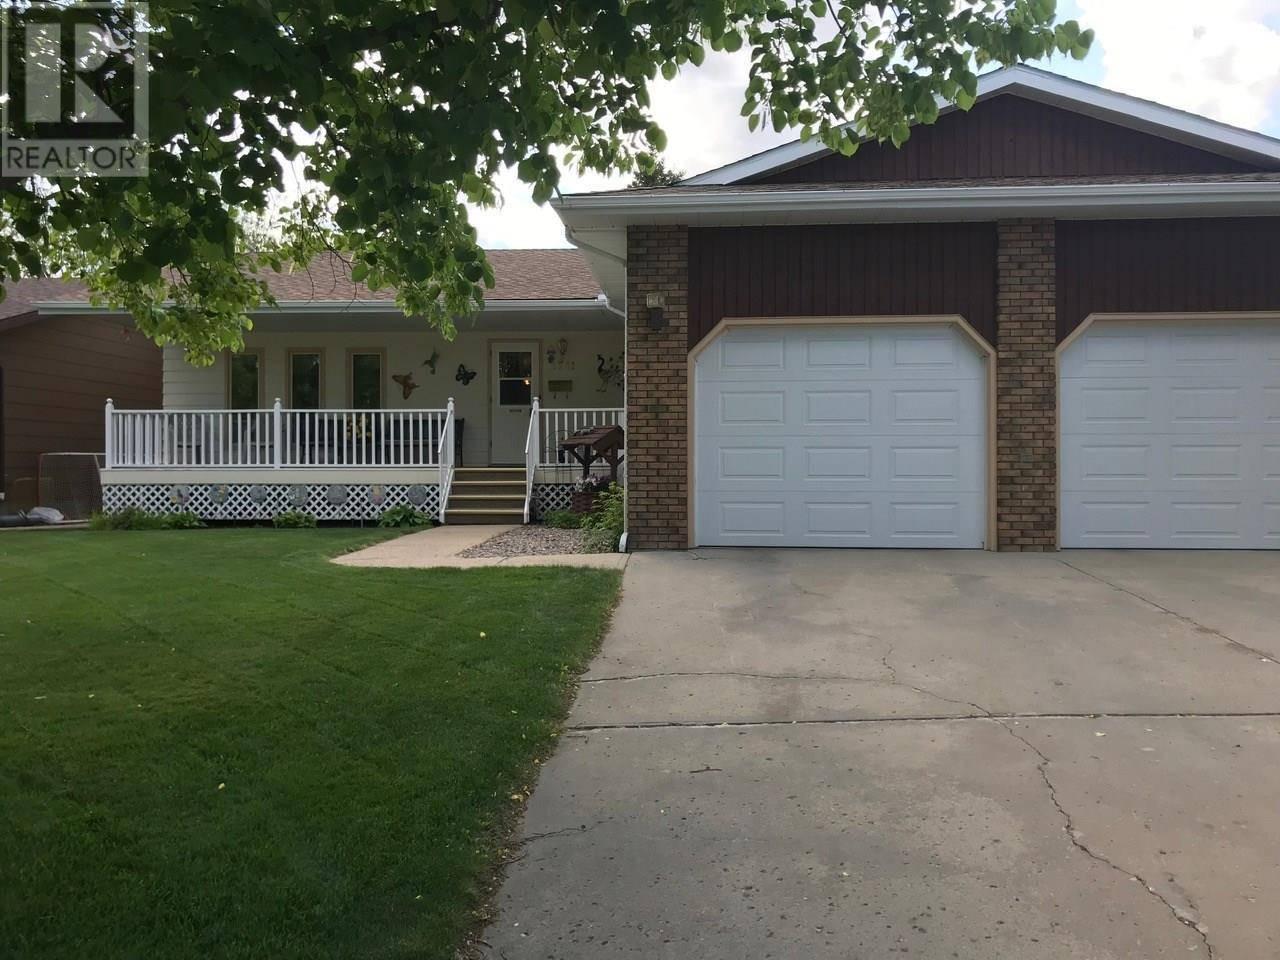 House for sale at 2341 Canary St North Battleford Saskatchewan - MLS: SK776577